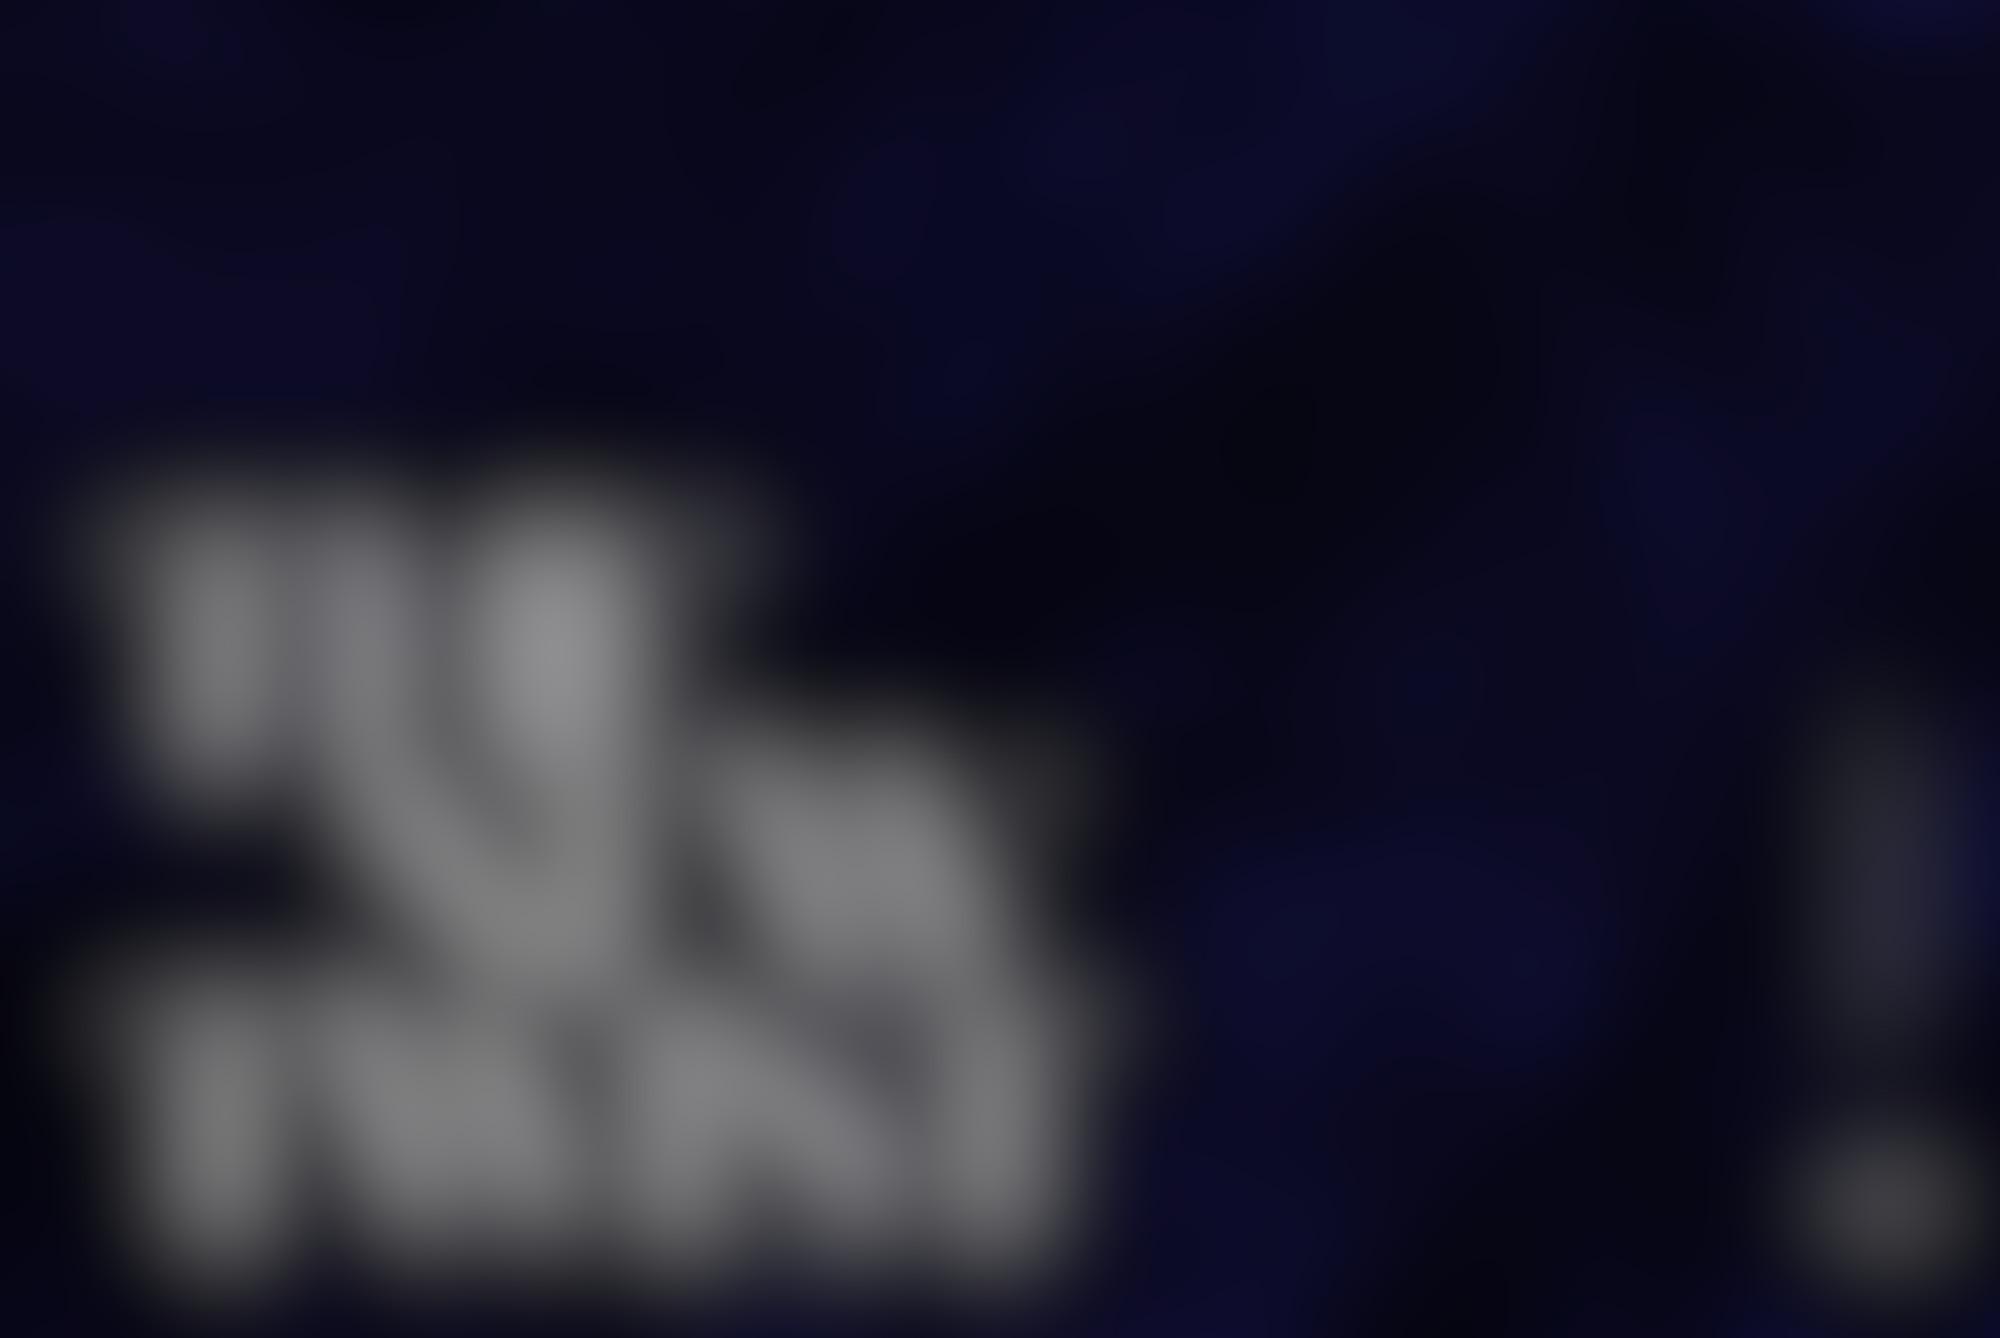 Sawdust x quainton 10 autocompressfitresizeixlibphp 1 1 0max h2000max w3 D2000q80s5c9b0d8696fba14c41119544c770461f